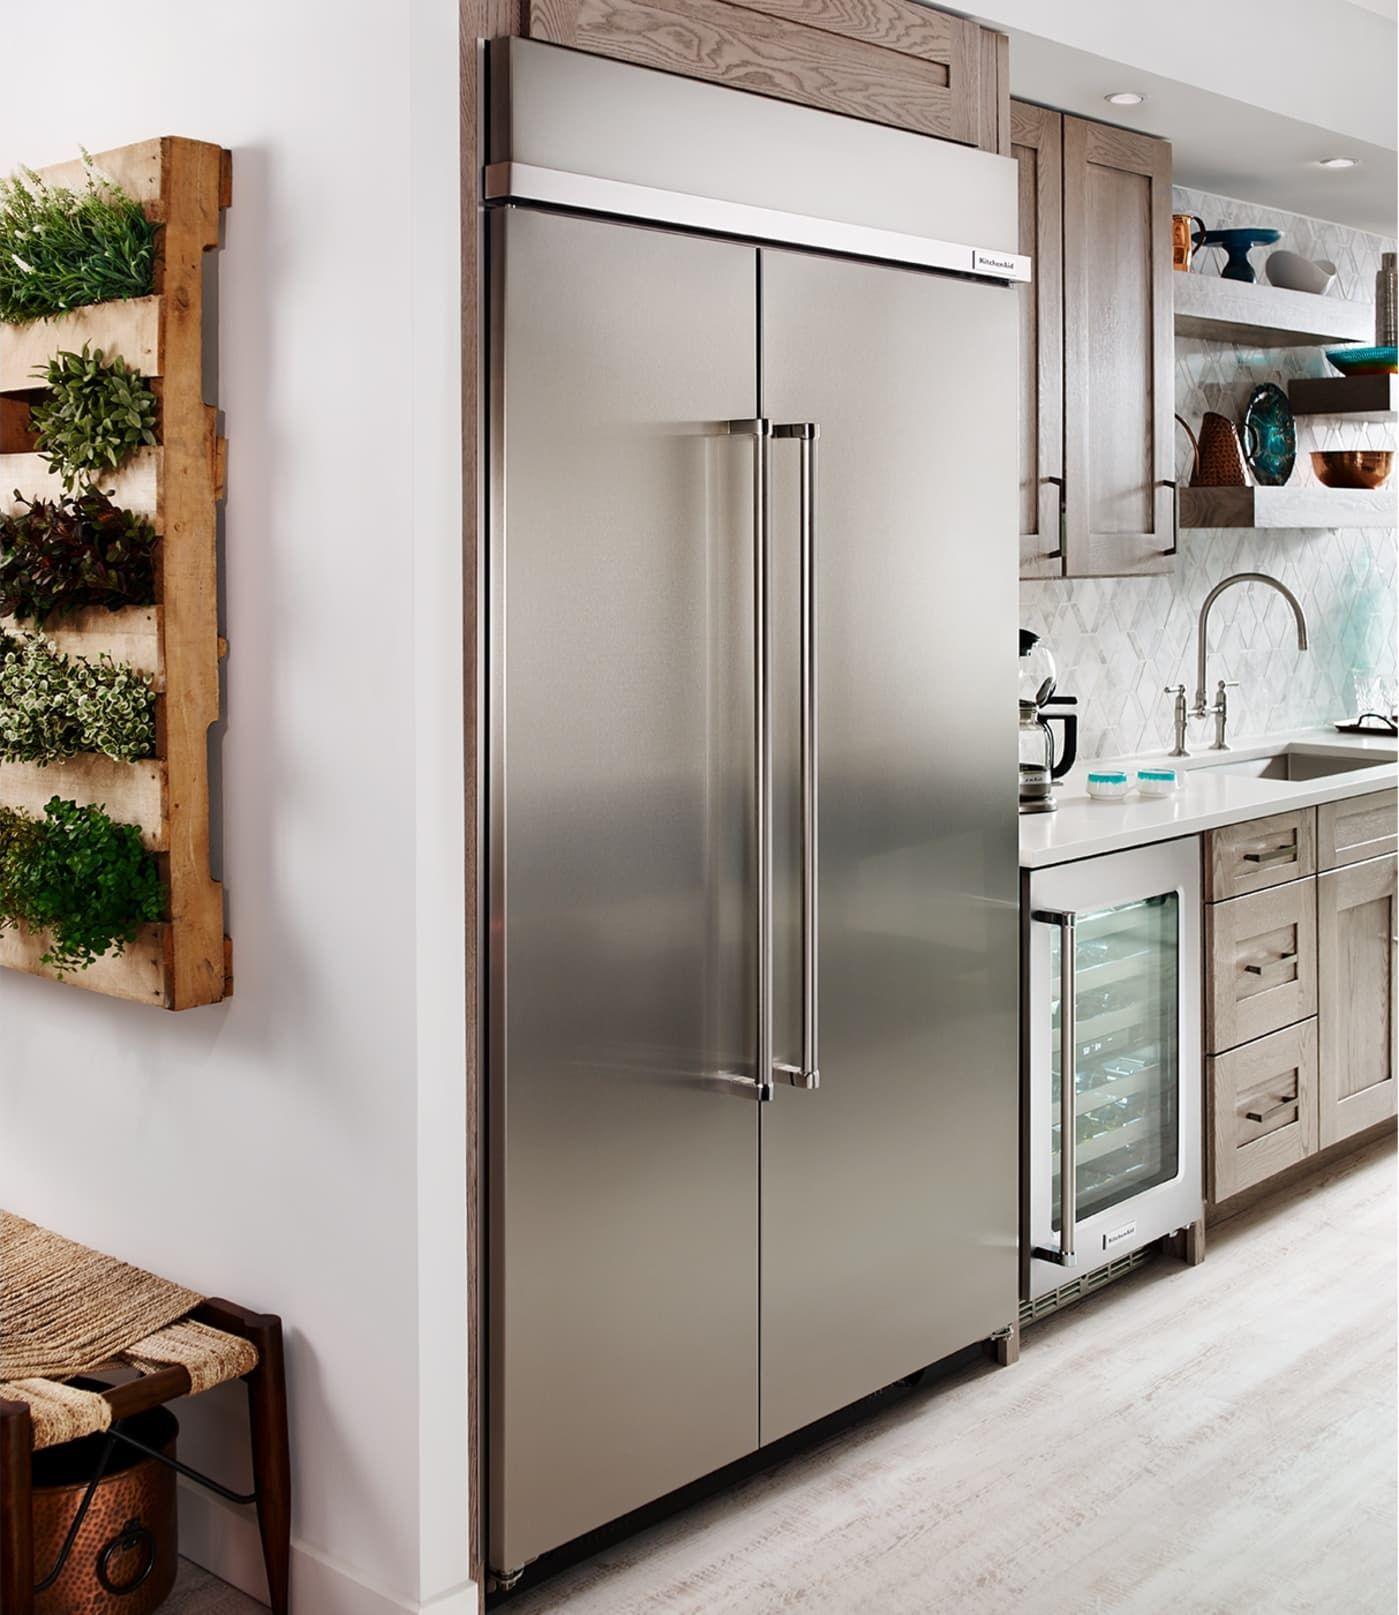 Kitchenaid Built In Refrigerator